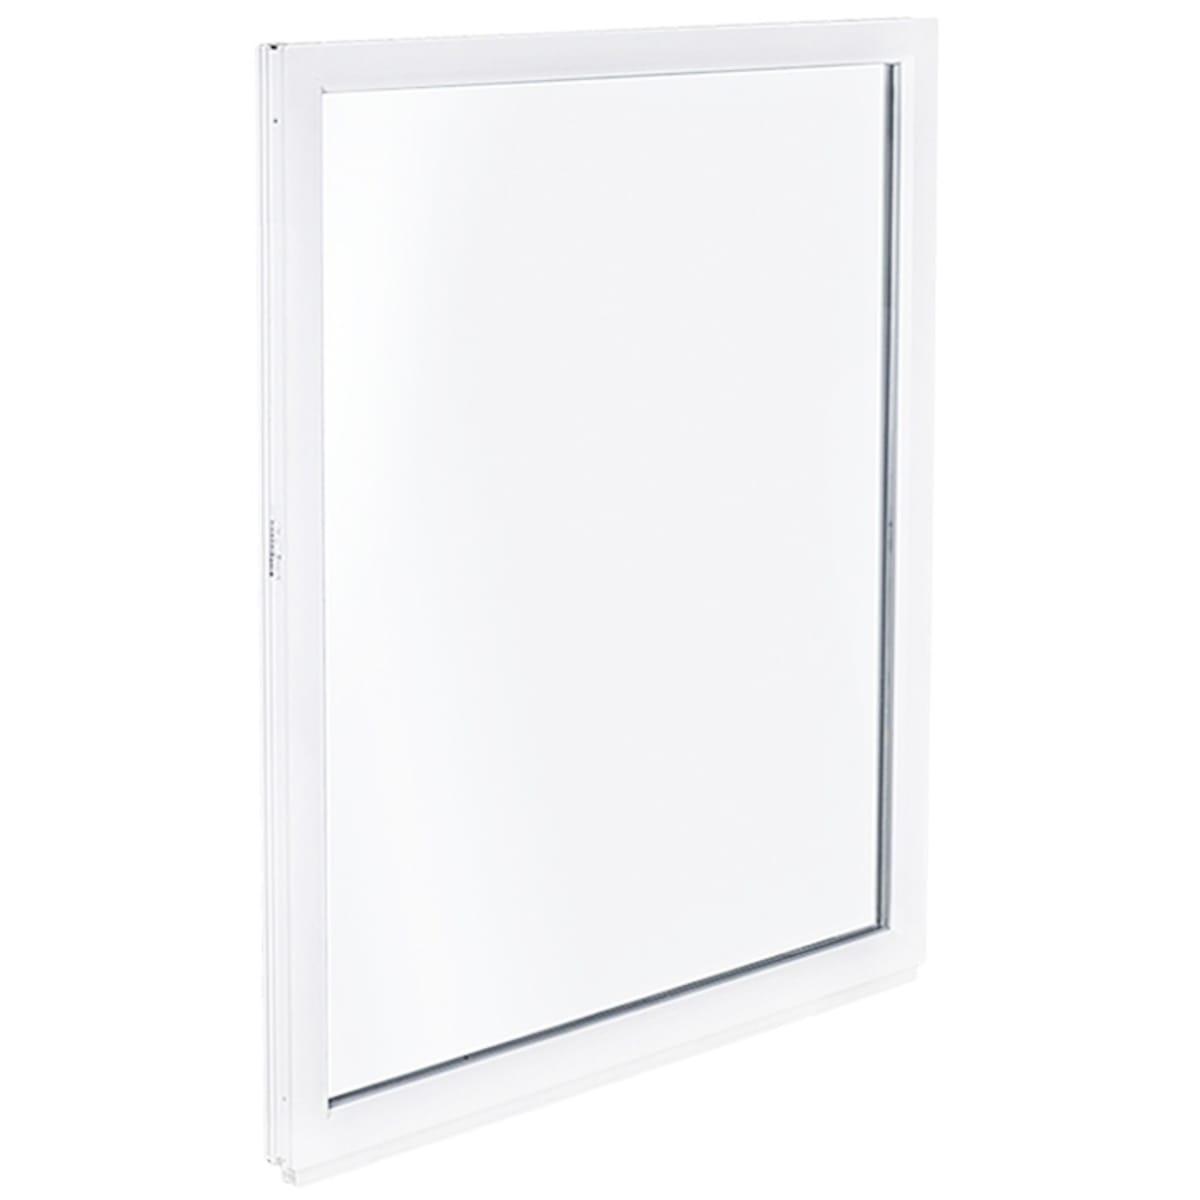 Окно ПВХ одностворчатое 90(87)х60 см глухое